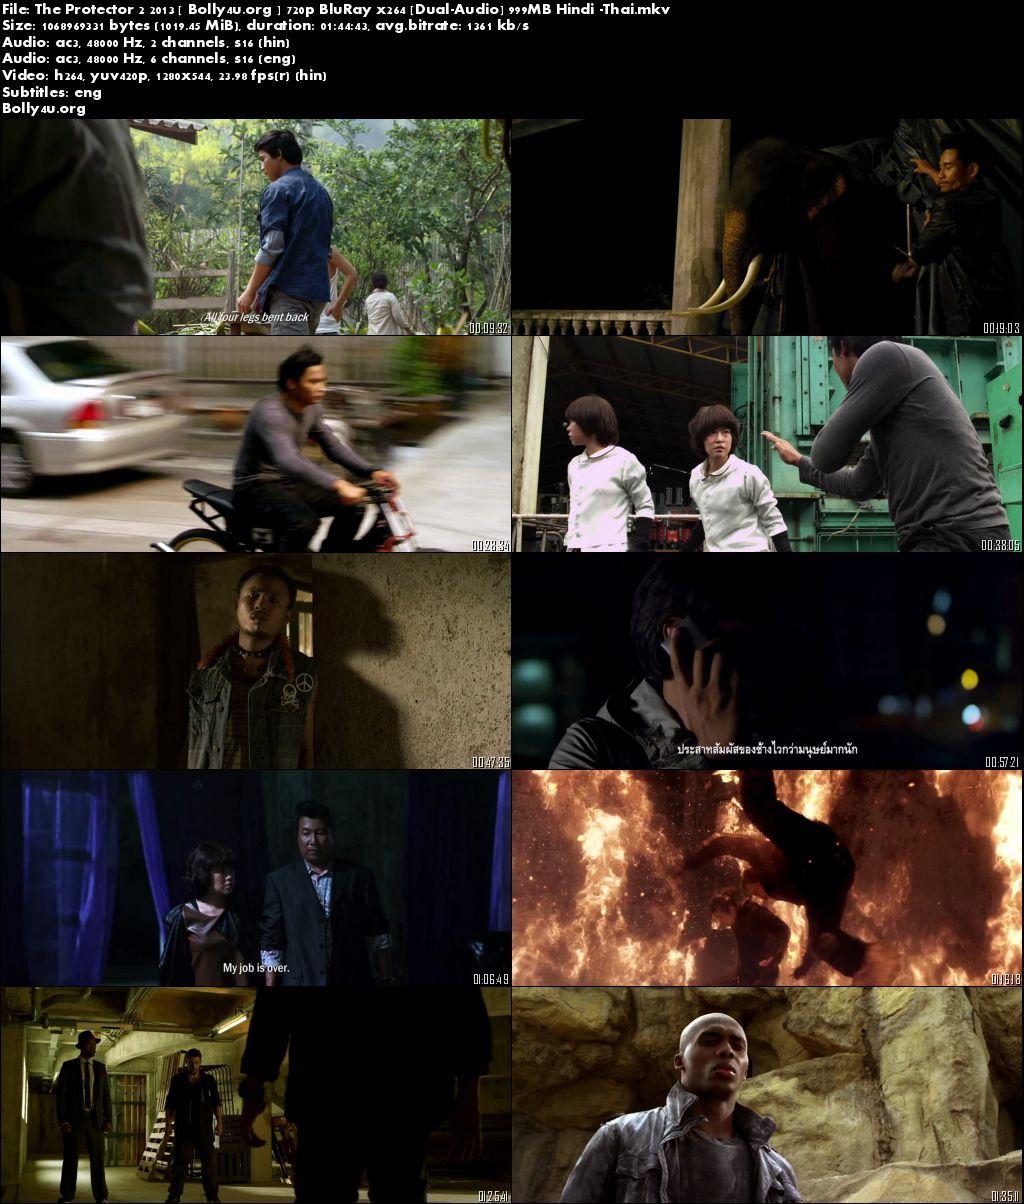 The Protector 2 2013 BluRay Hindi 720p Dual Audio 999Mb Download